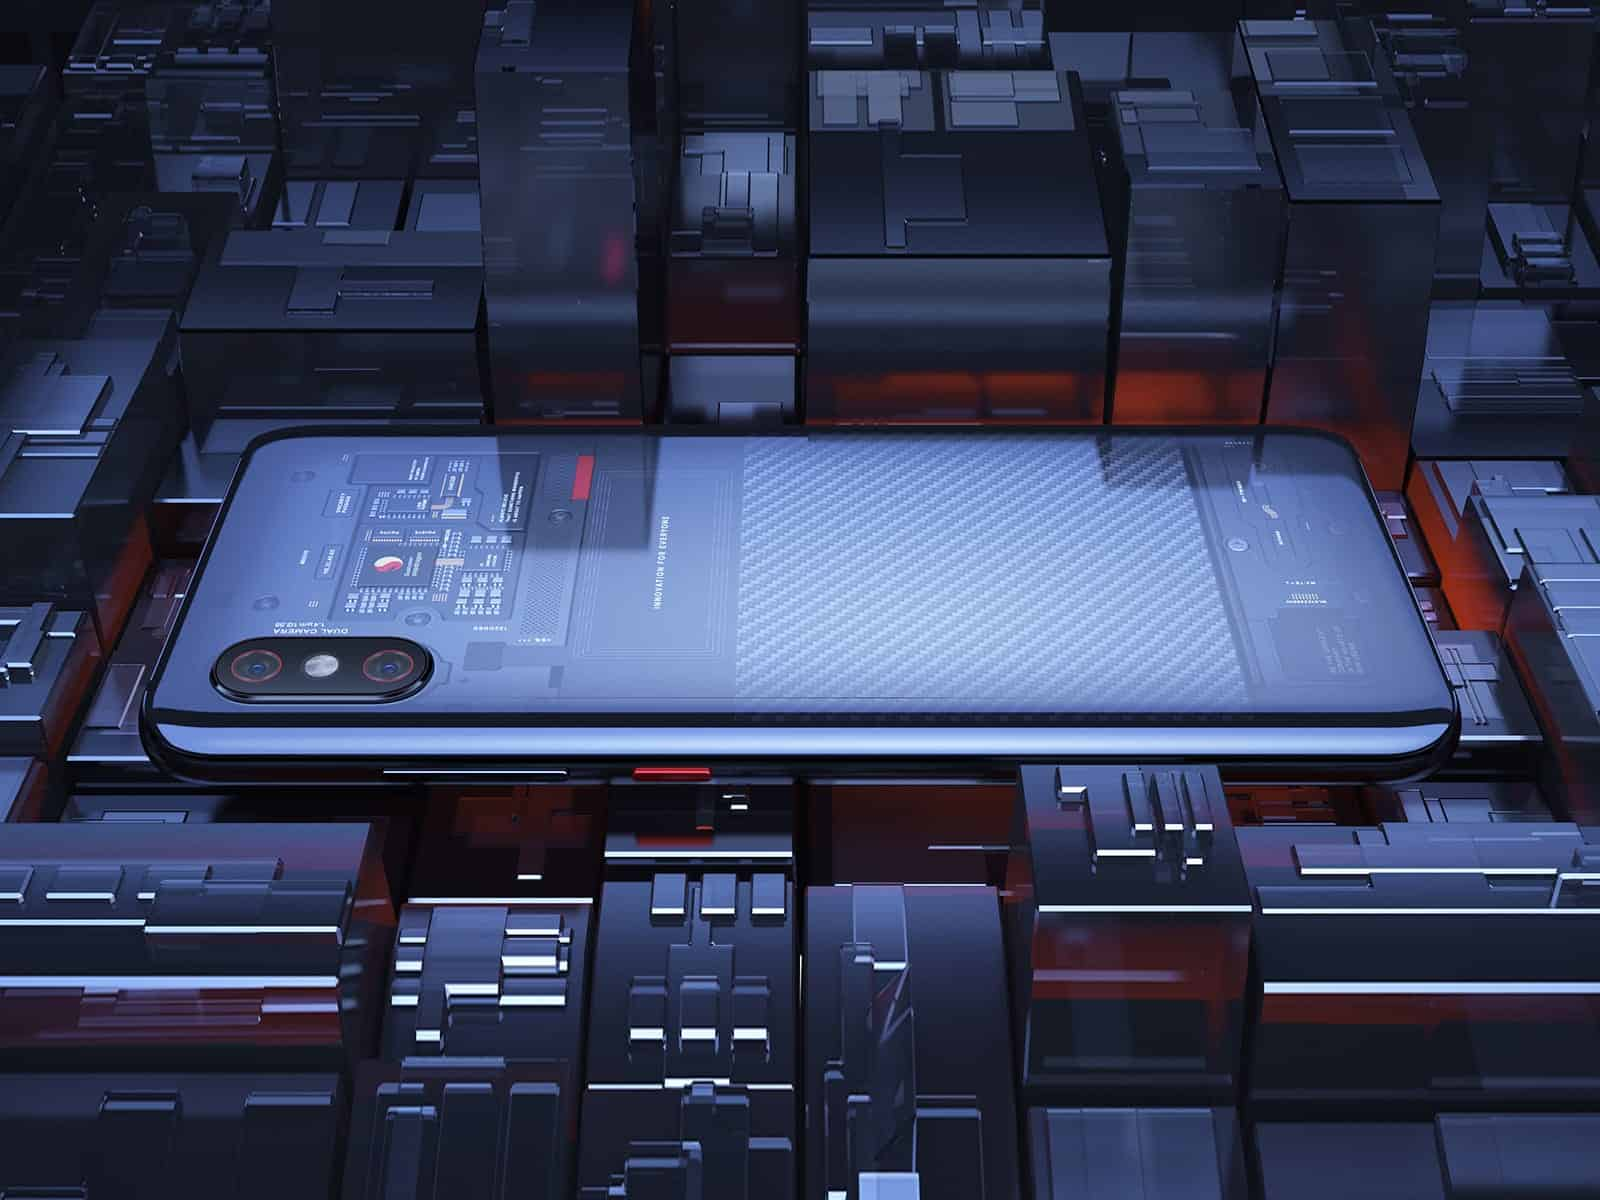 Xiaomi Mi 8 Explorer Edition official image 6